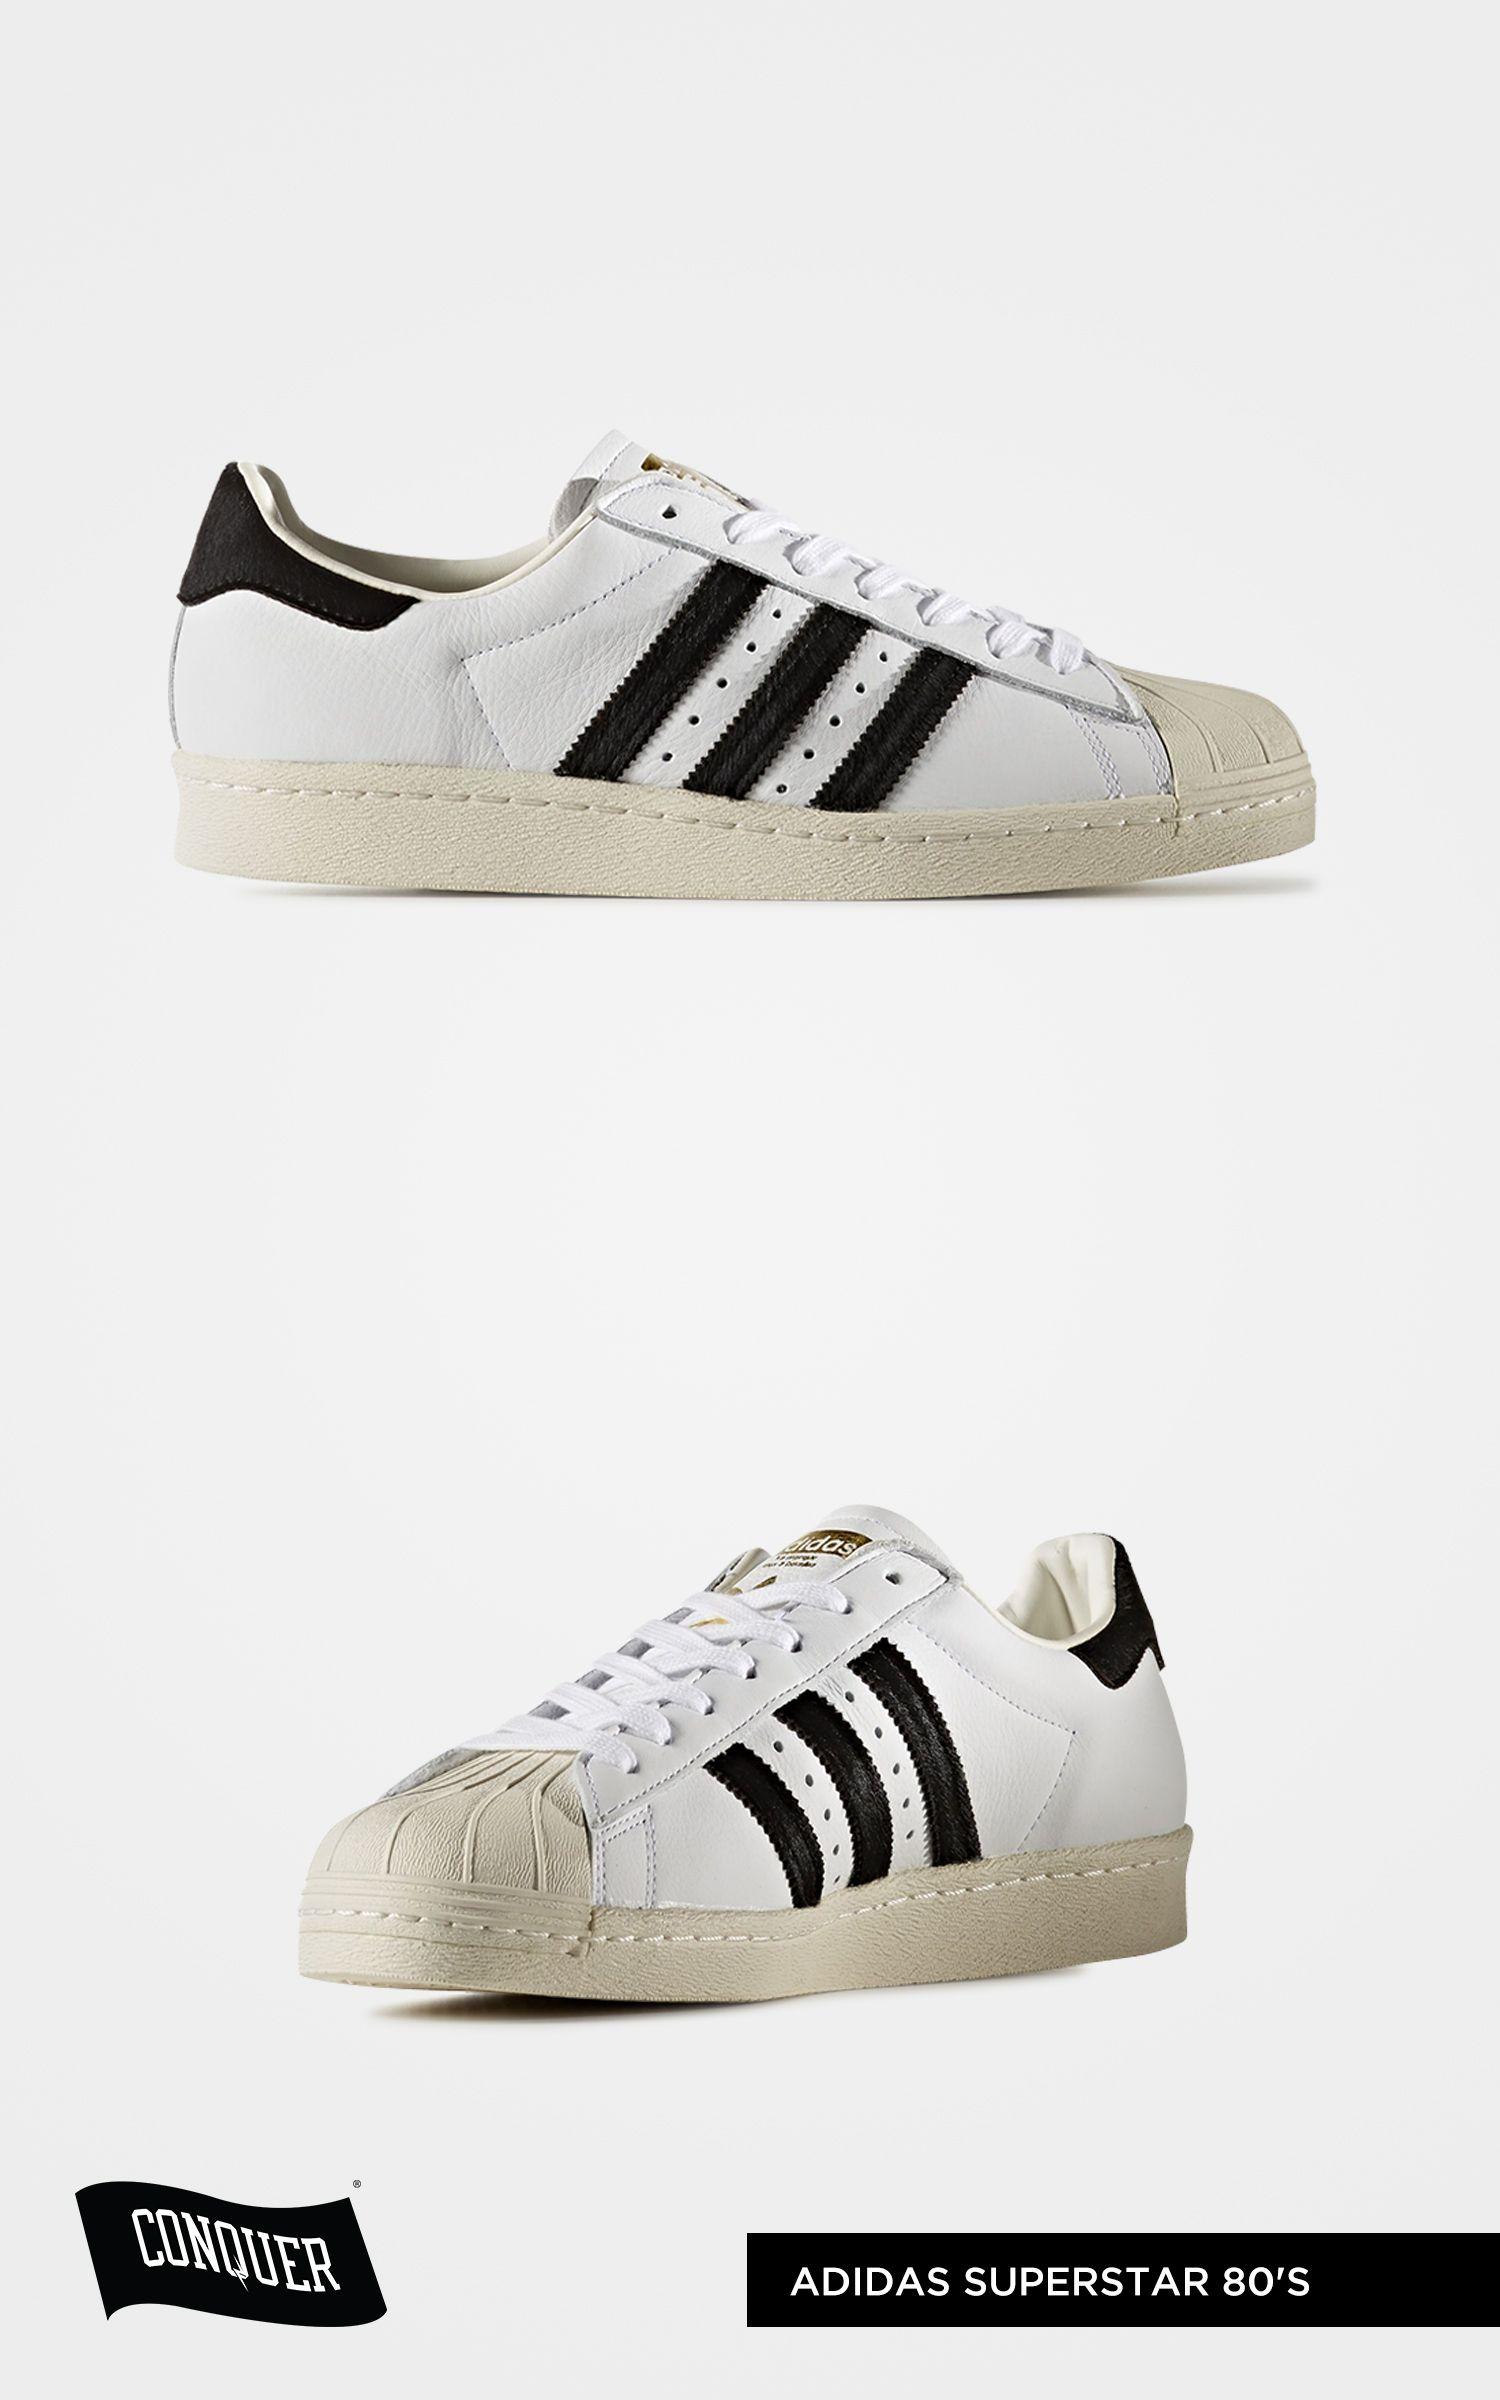 7b5eb3fc Adidas Superstar 80's Running White Ftw / Black / Metallic Gold BB2231 AED  475 Visit: www.weconquer.me